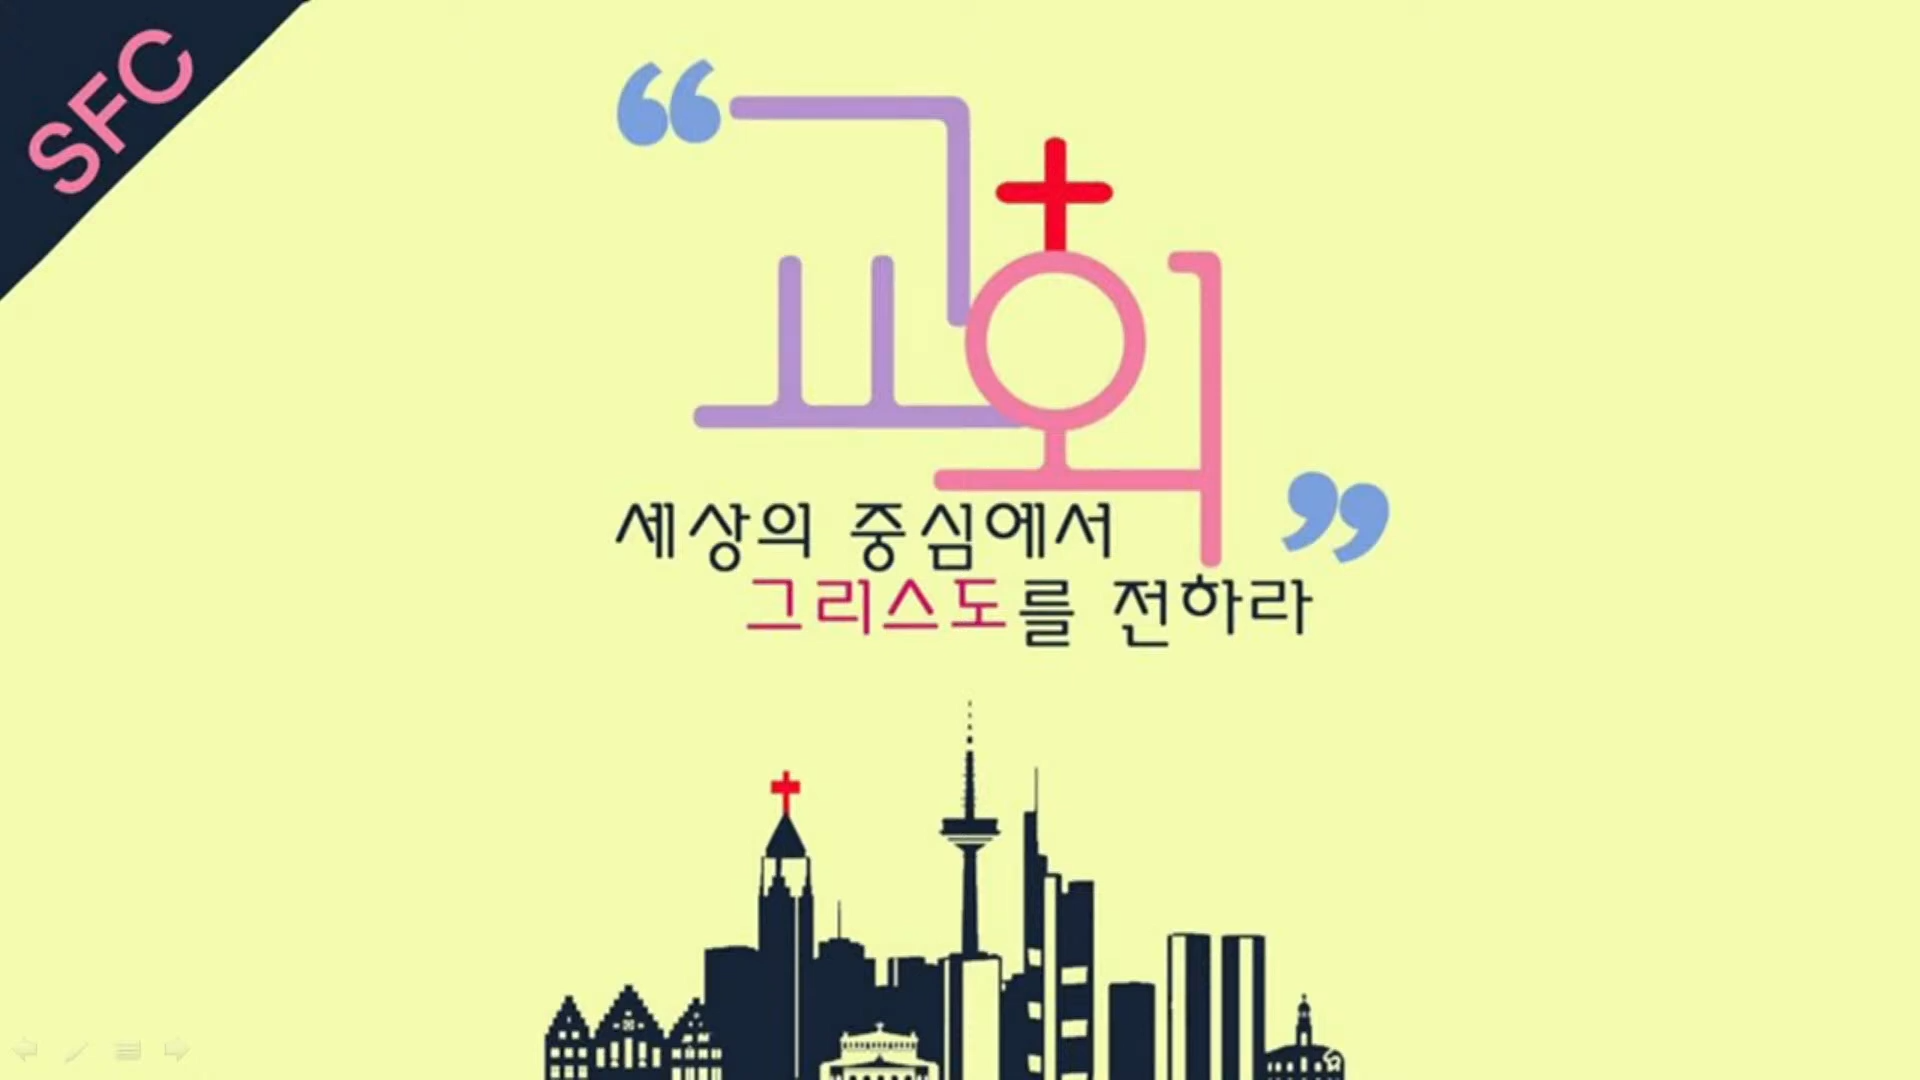 2021sfc겨울중고수련회.png